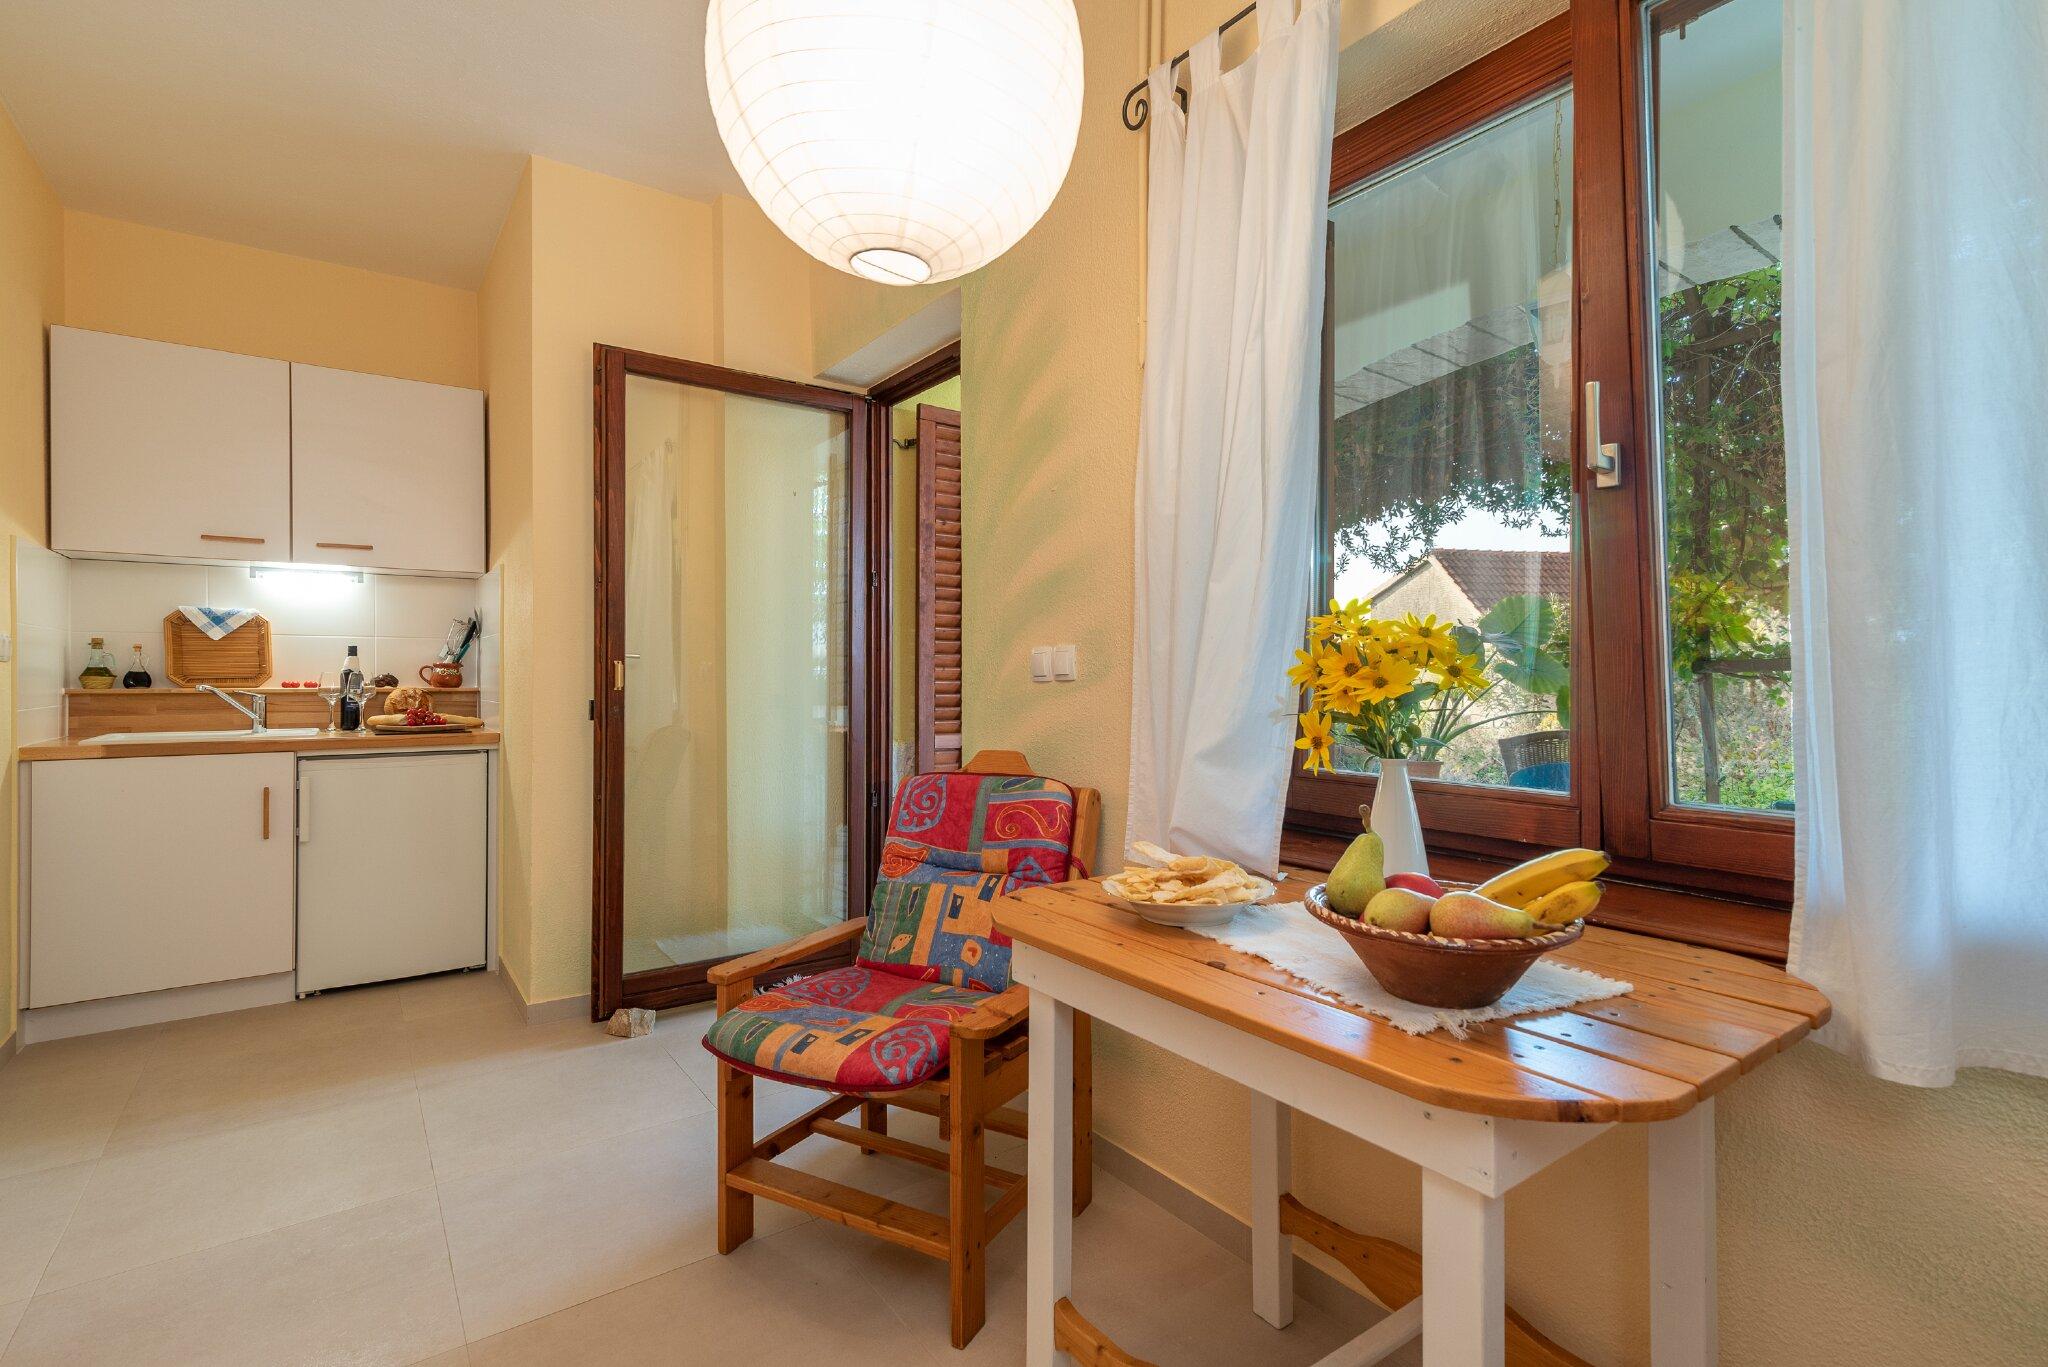 Bathroom Roof Apartment